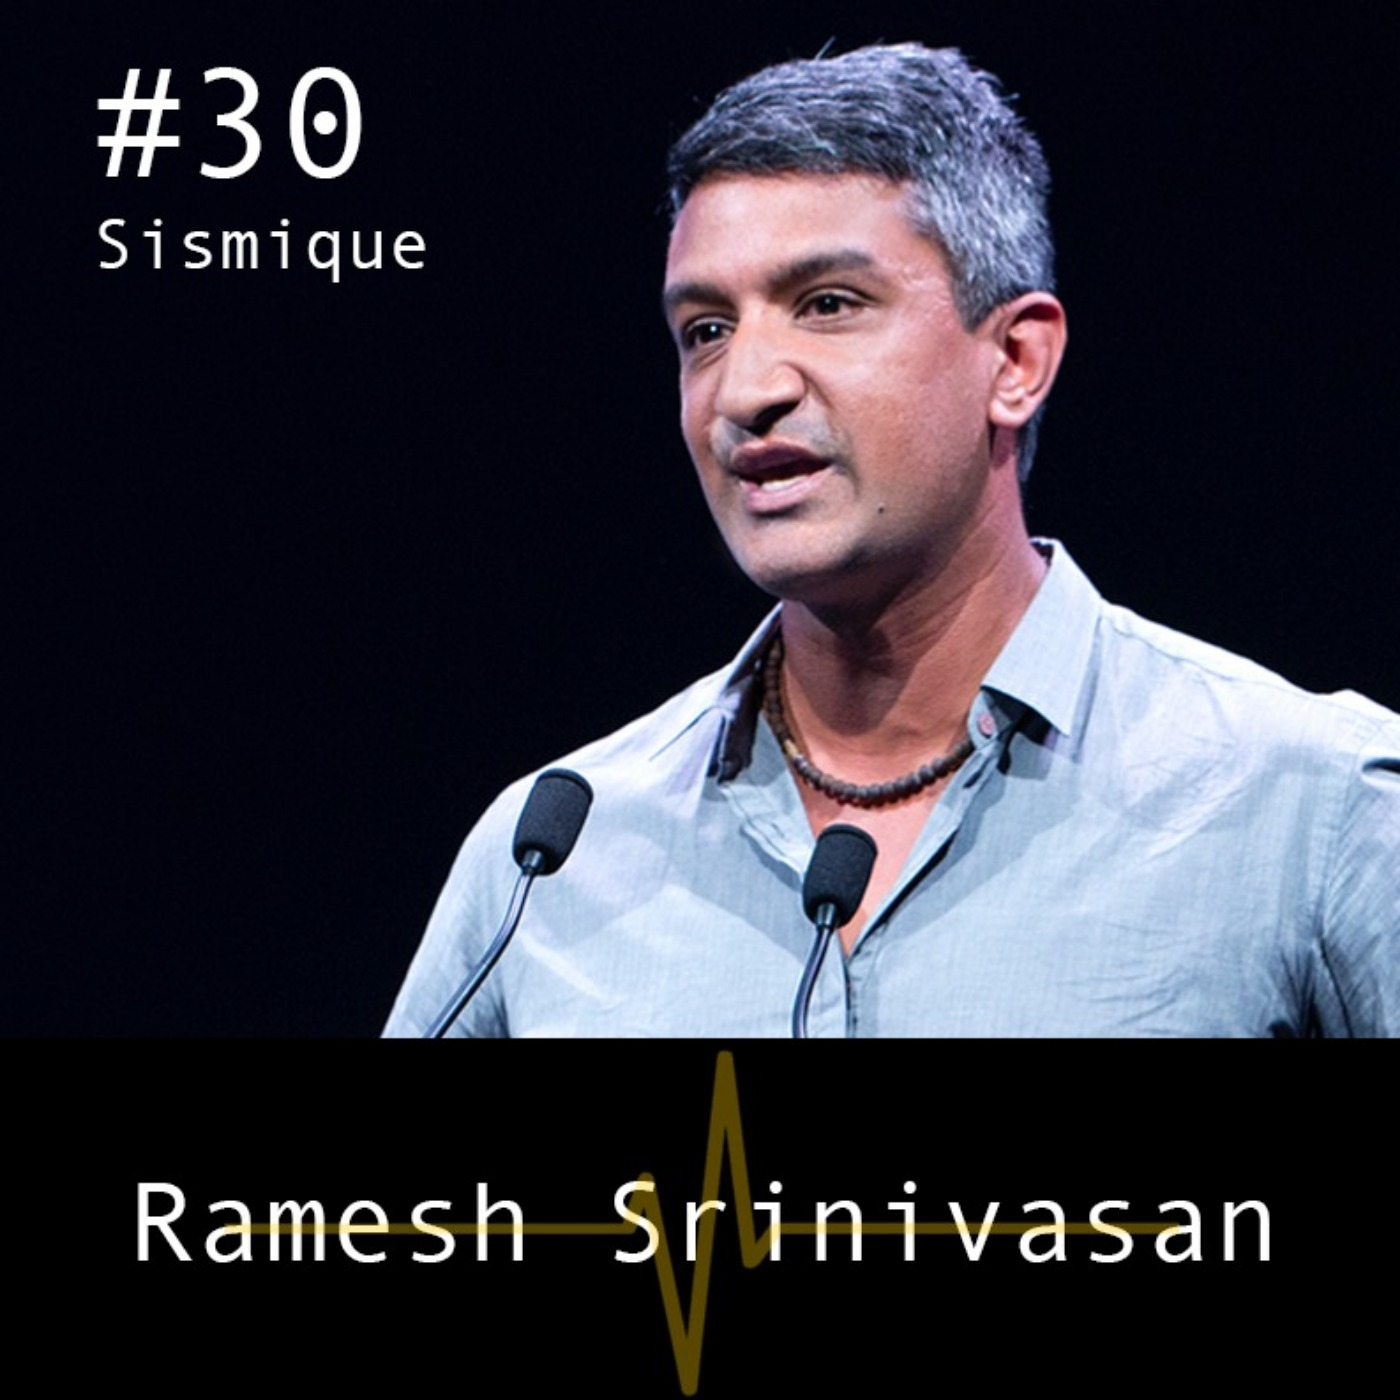 Rethinking how technology shapes the world - Ramesh Srinivasan